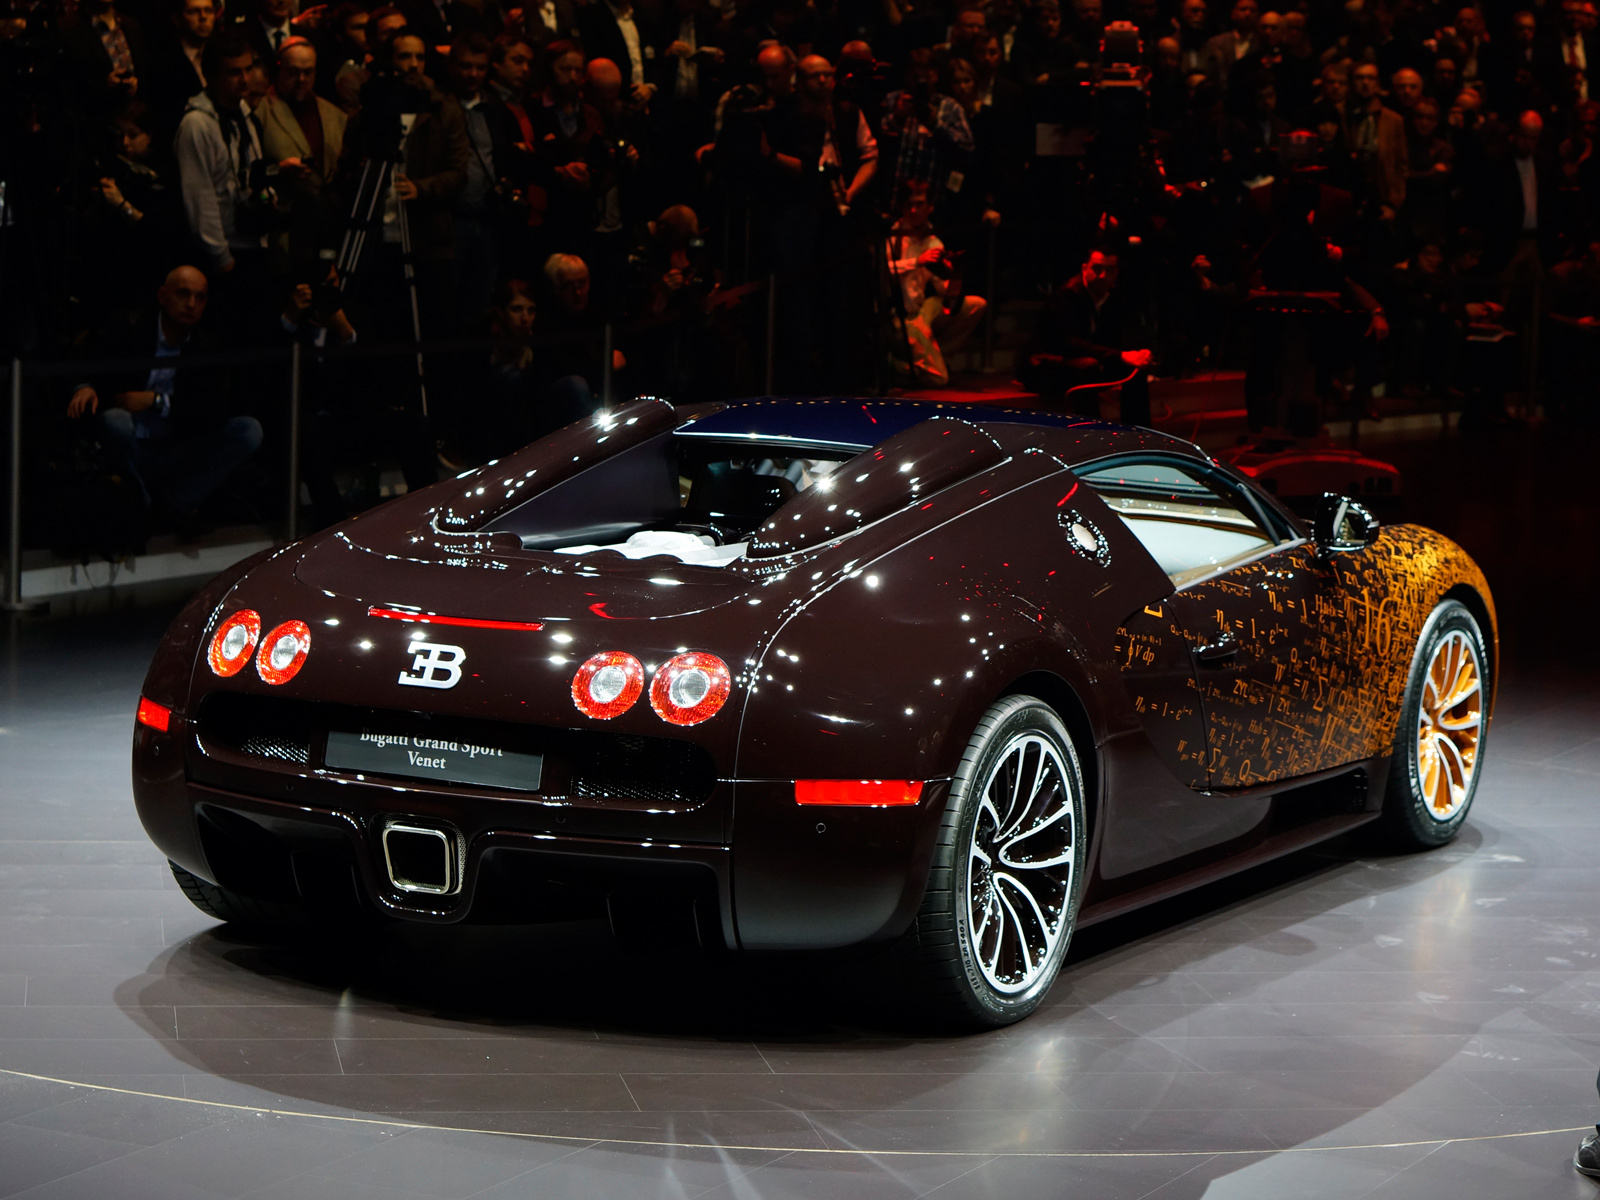 refcars bugatti veyron grand sport venet special edition. Black Bedroom Furniture Sets. Home Design Ideas